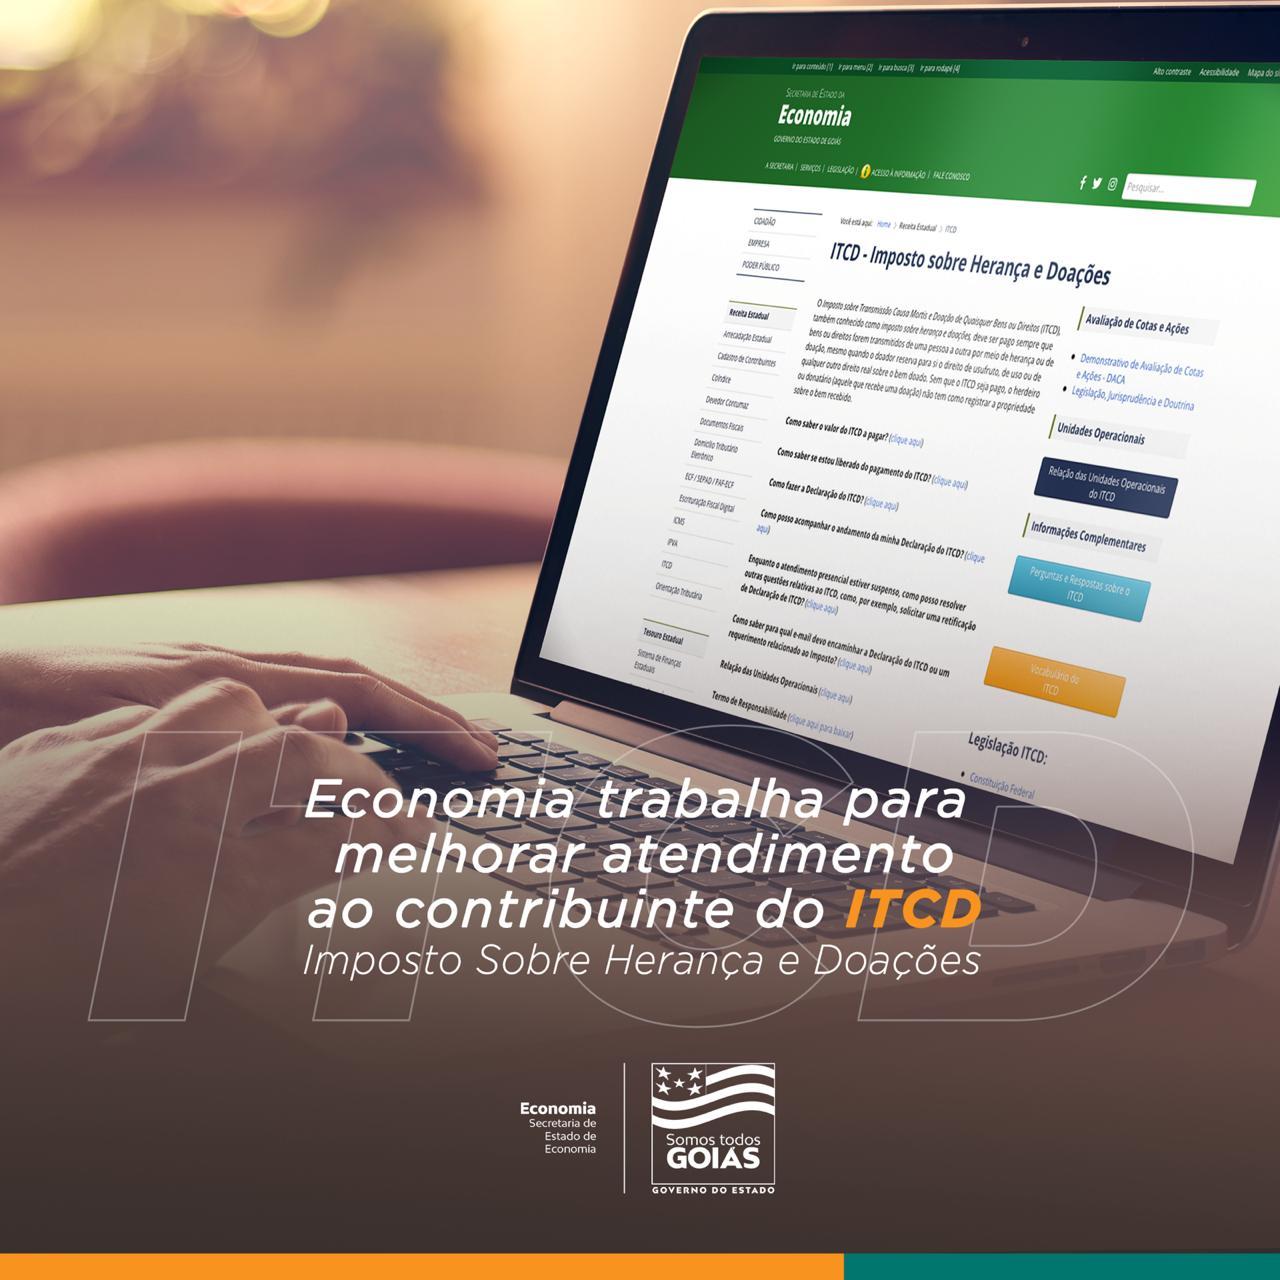 Economia busca simplificar acesso do contribuinte ao ITCD – Goiás